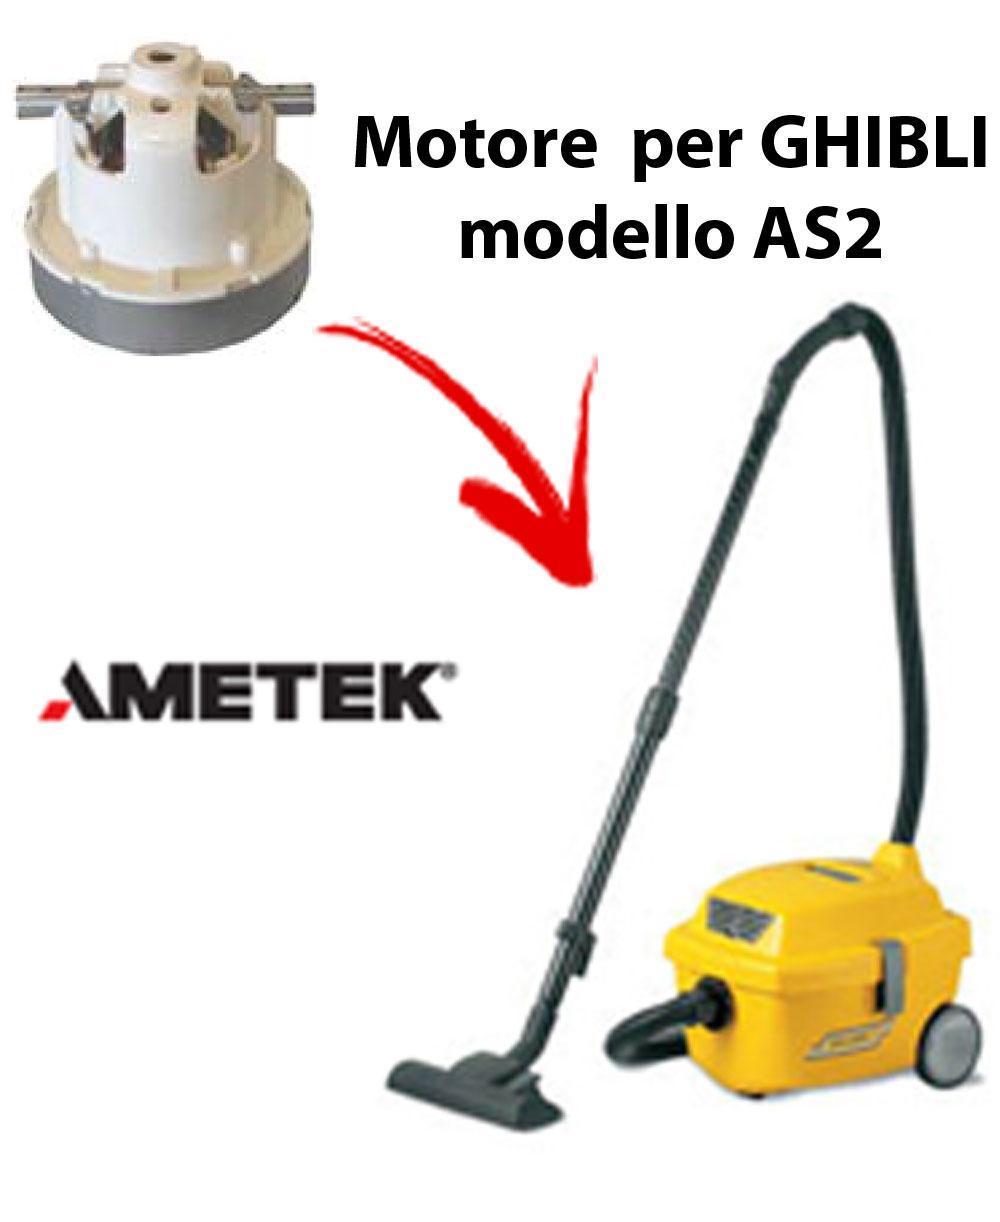 AS2  Motore de aspiración AMETEK para aspiradora GHIBLI